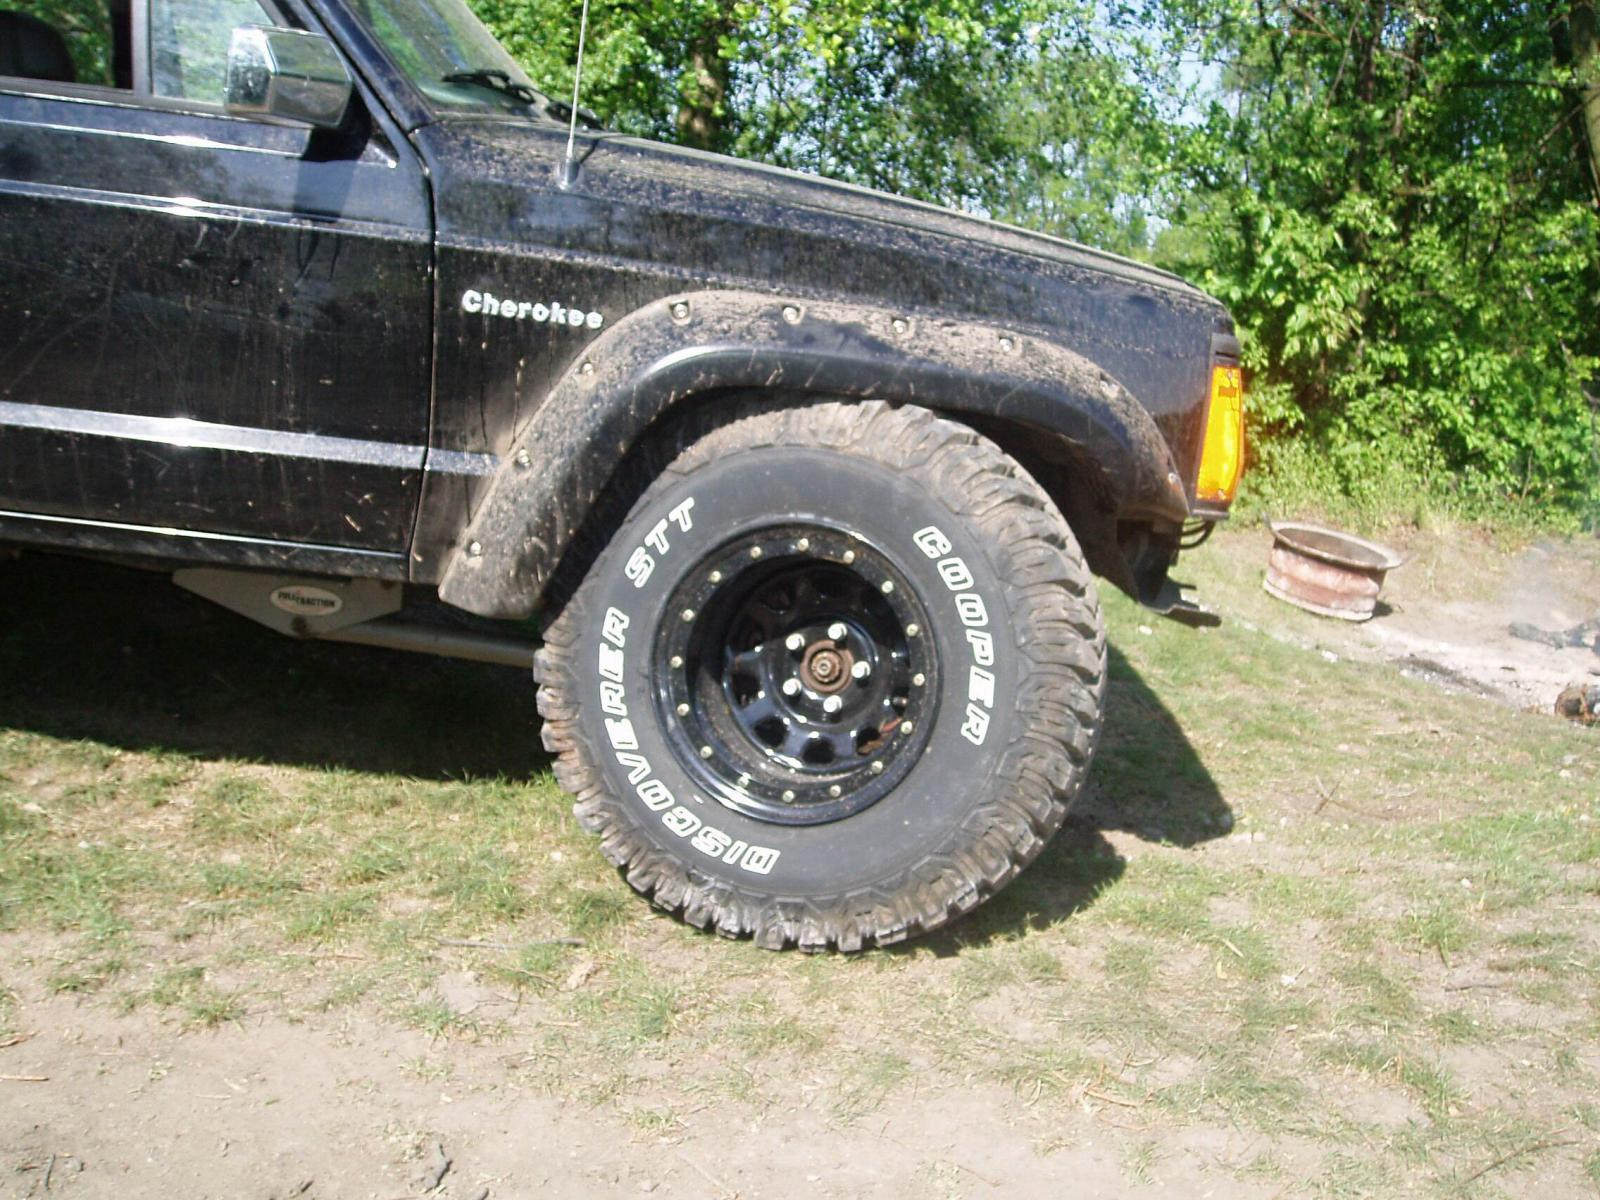 "1989 Jeep Cherokee 4 0 L long arm Fulltraction lift 6"" disky 15"